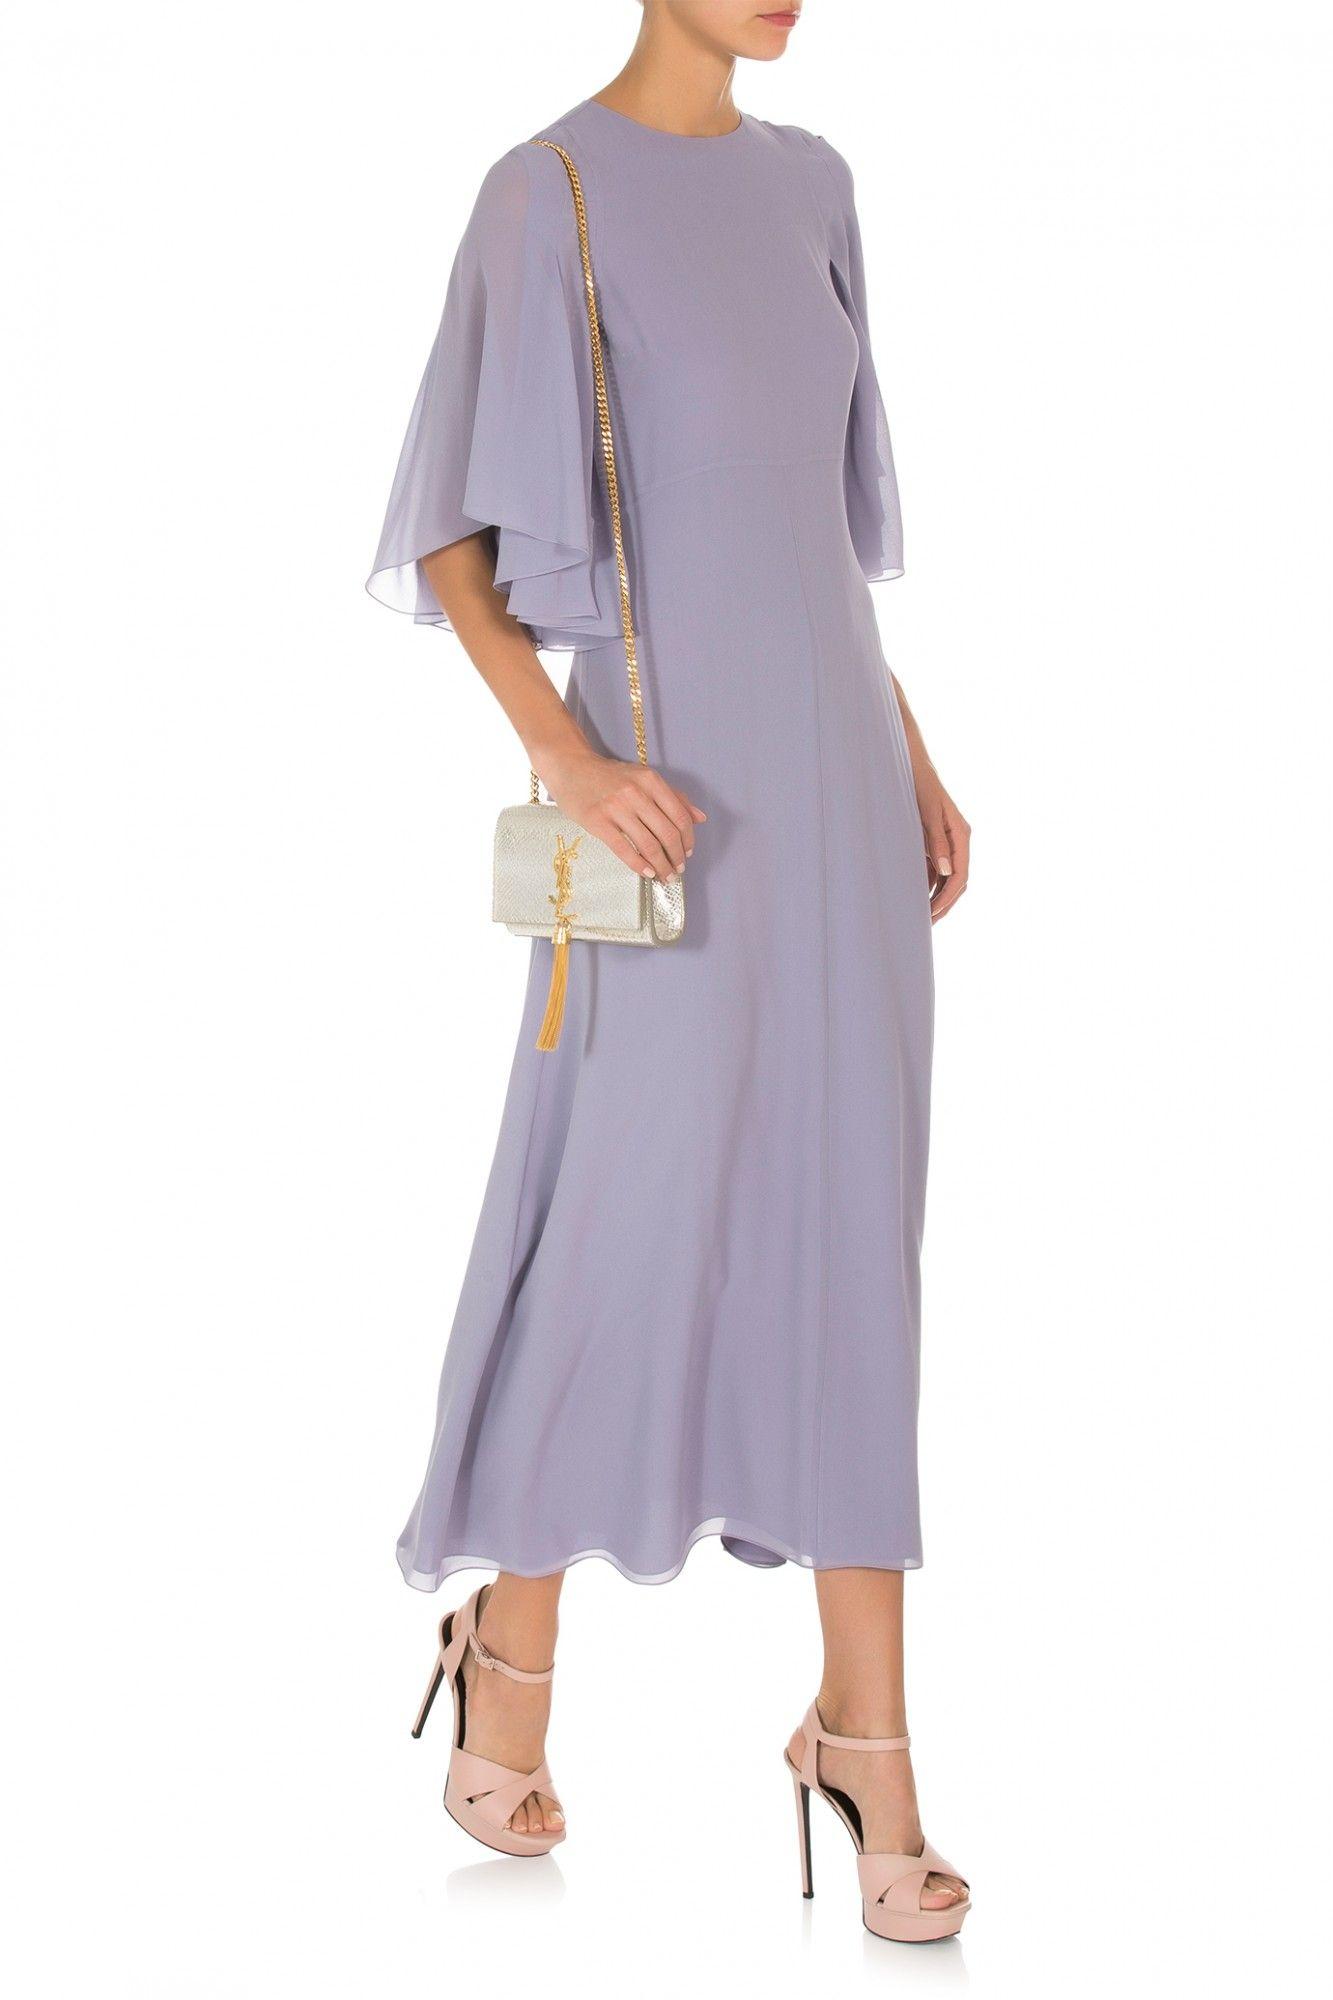 Saint Laurent Ruffle Sleeve Dress